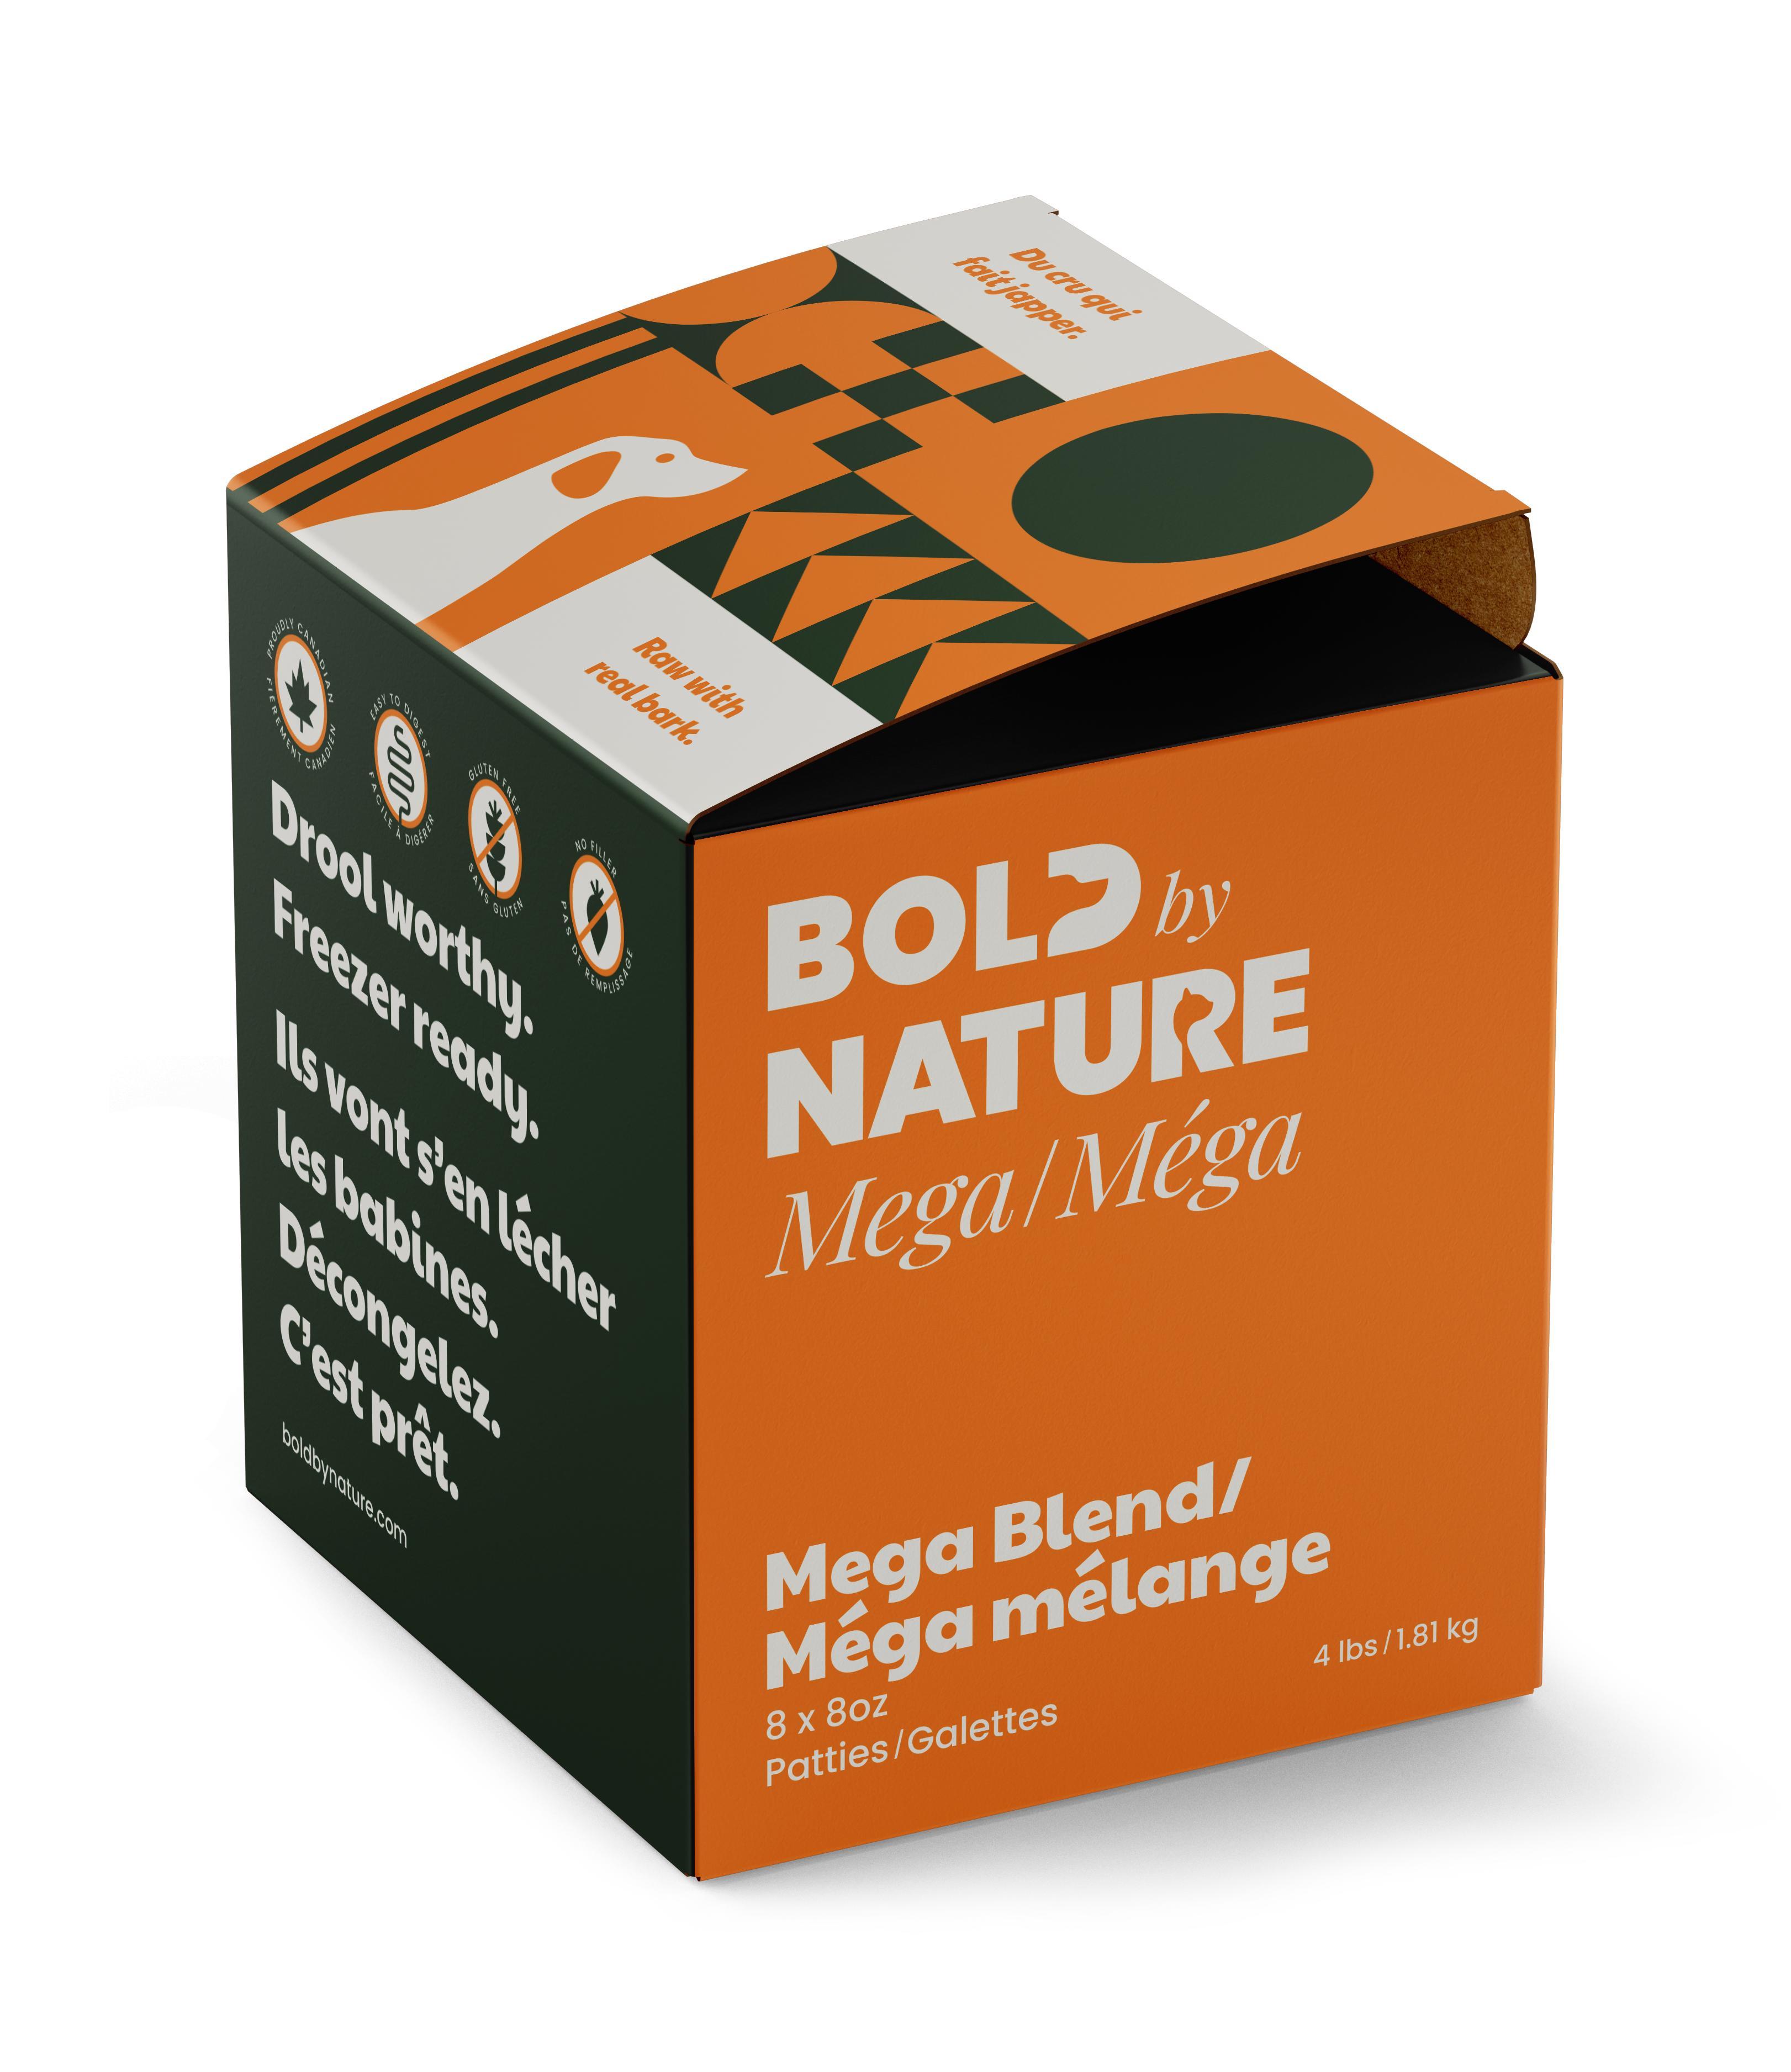 Bold by Nature Dog Mega Blend Patties Dog Food, 4-lb